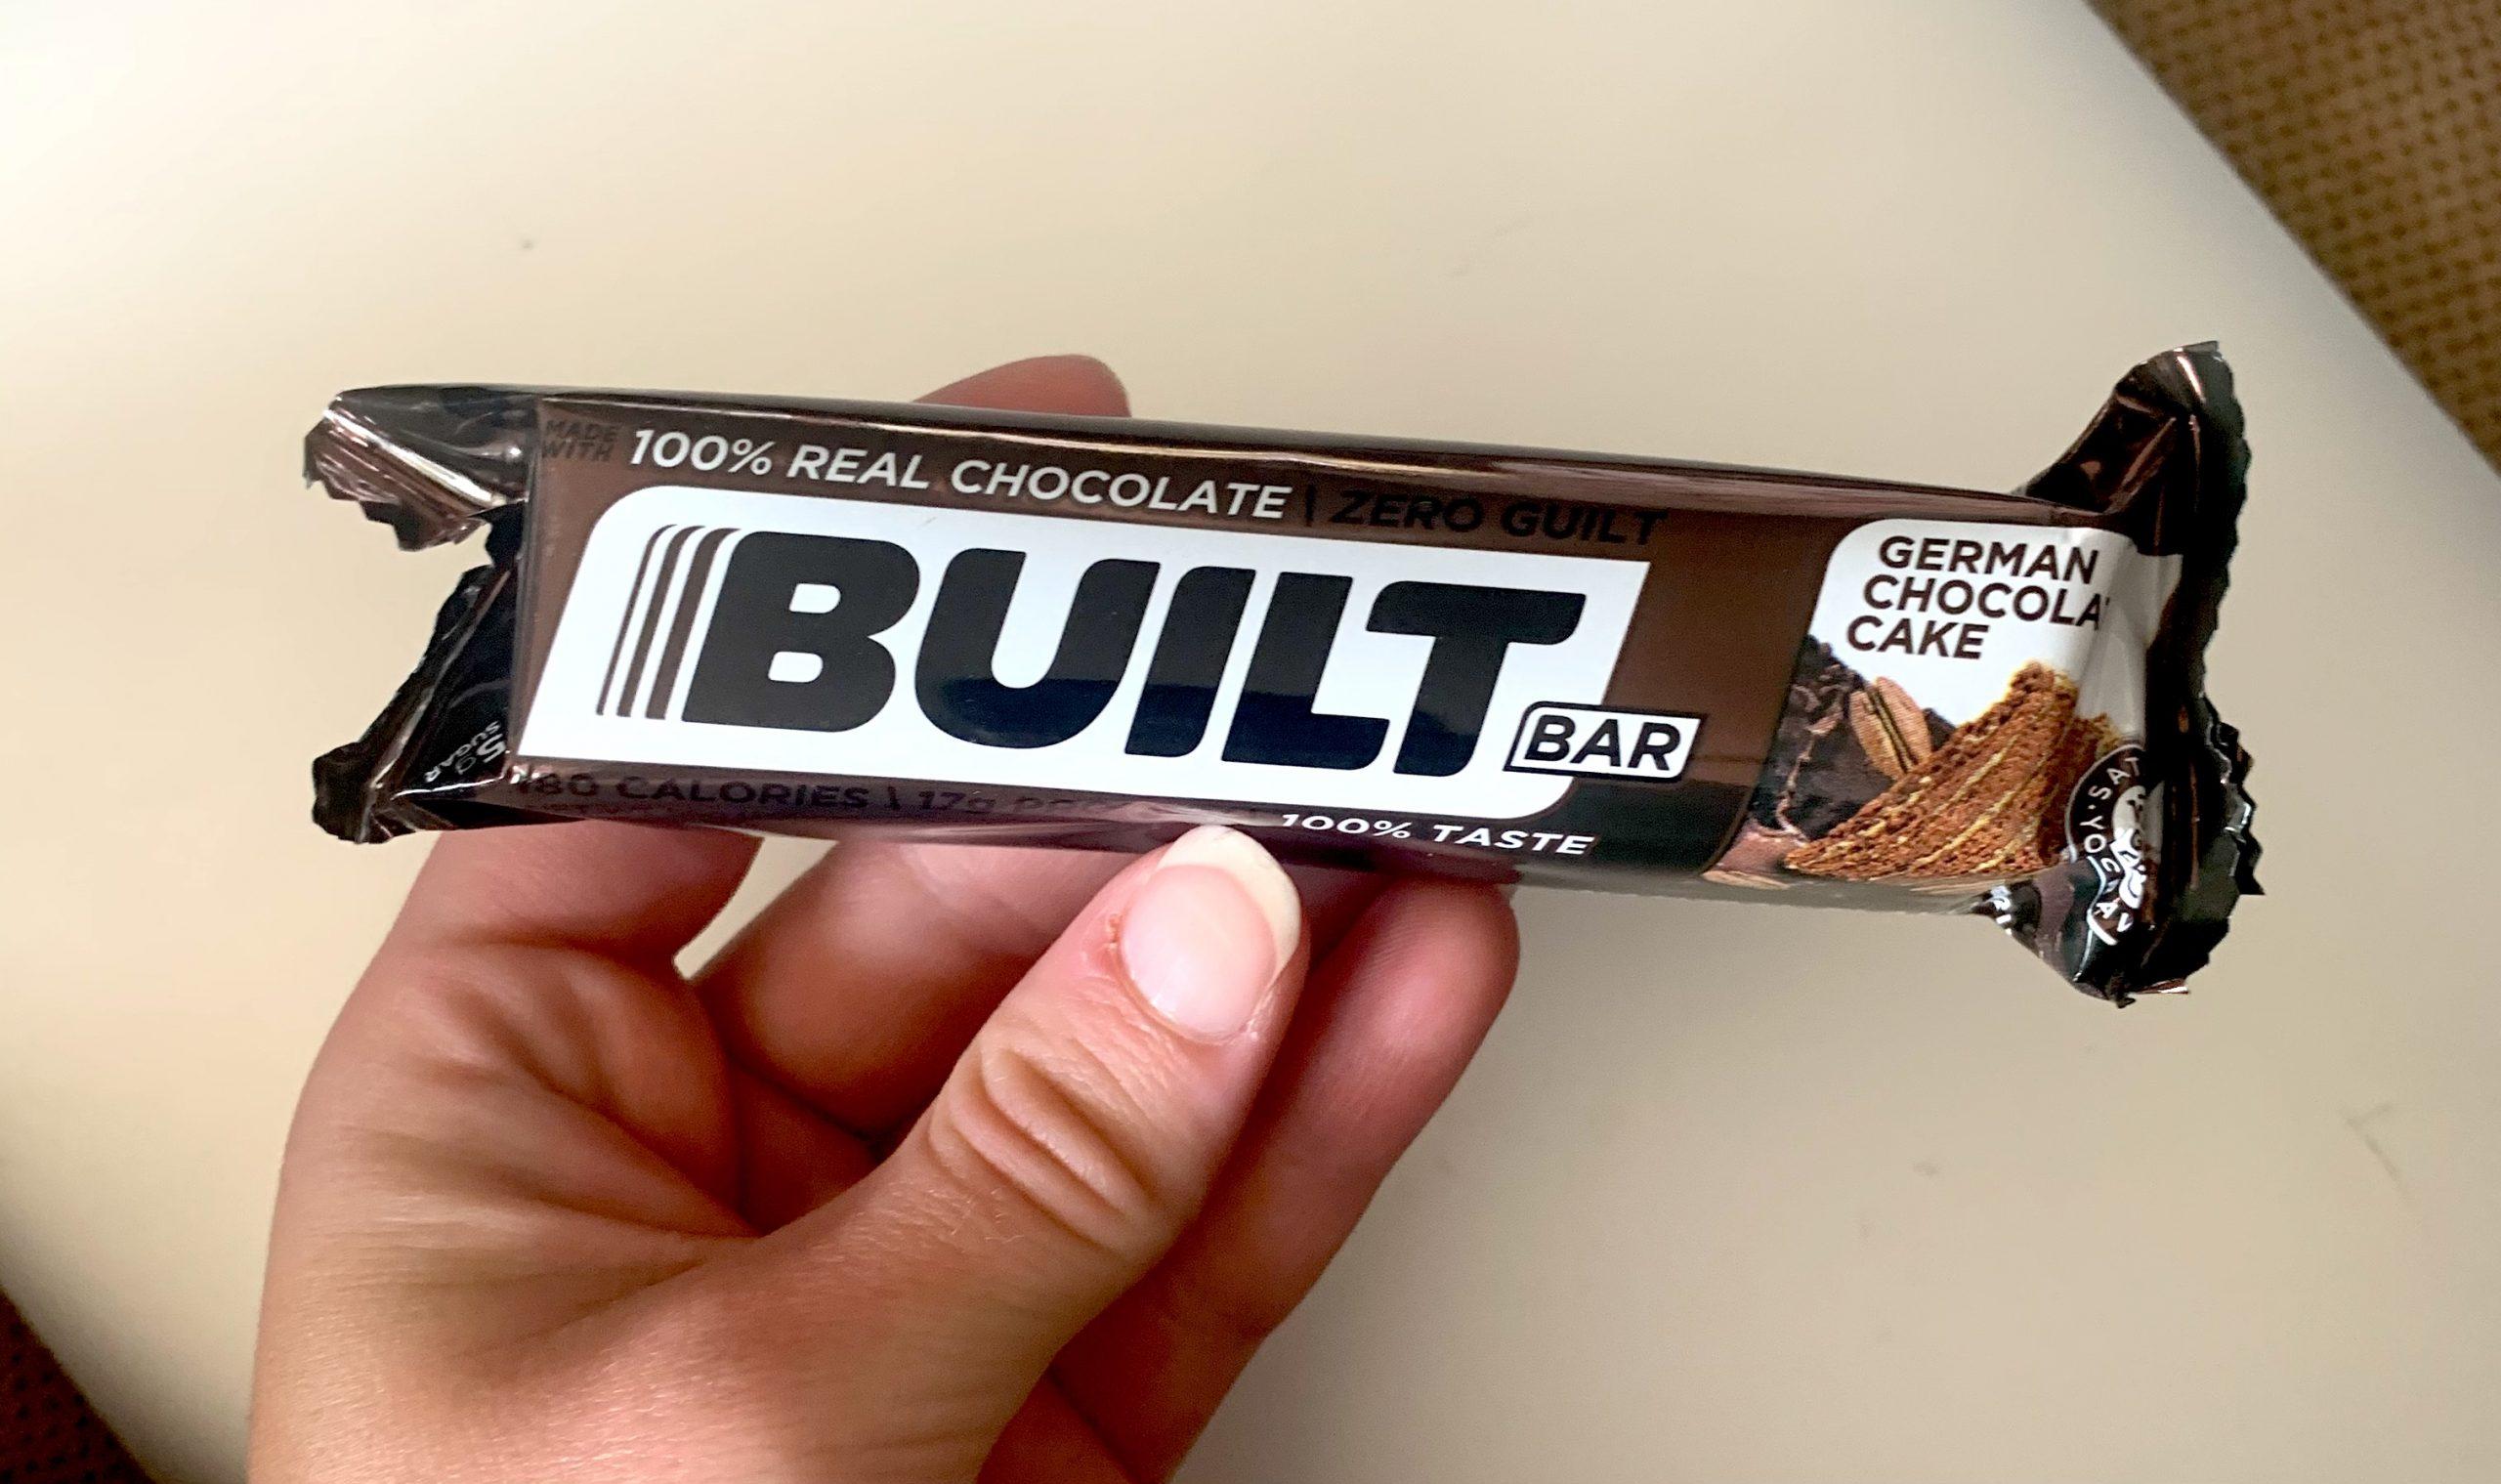 German Chocolate cake built bar review